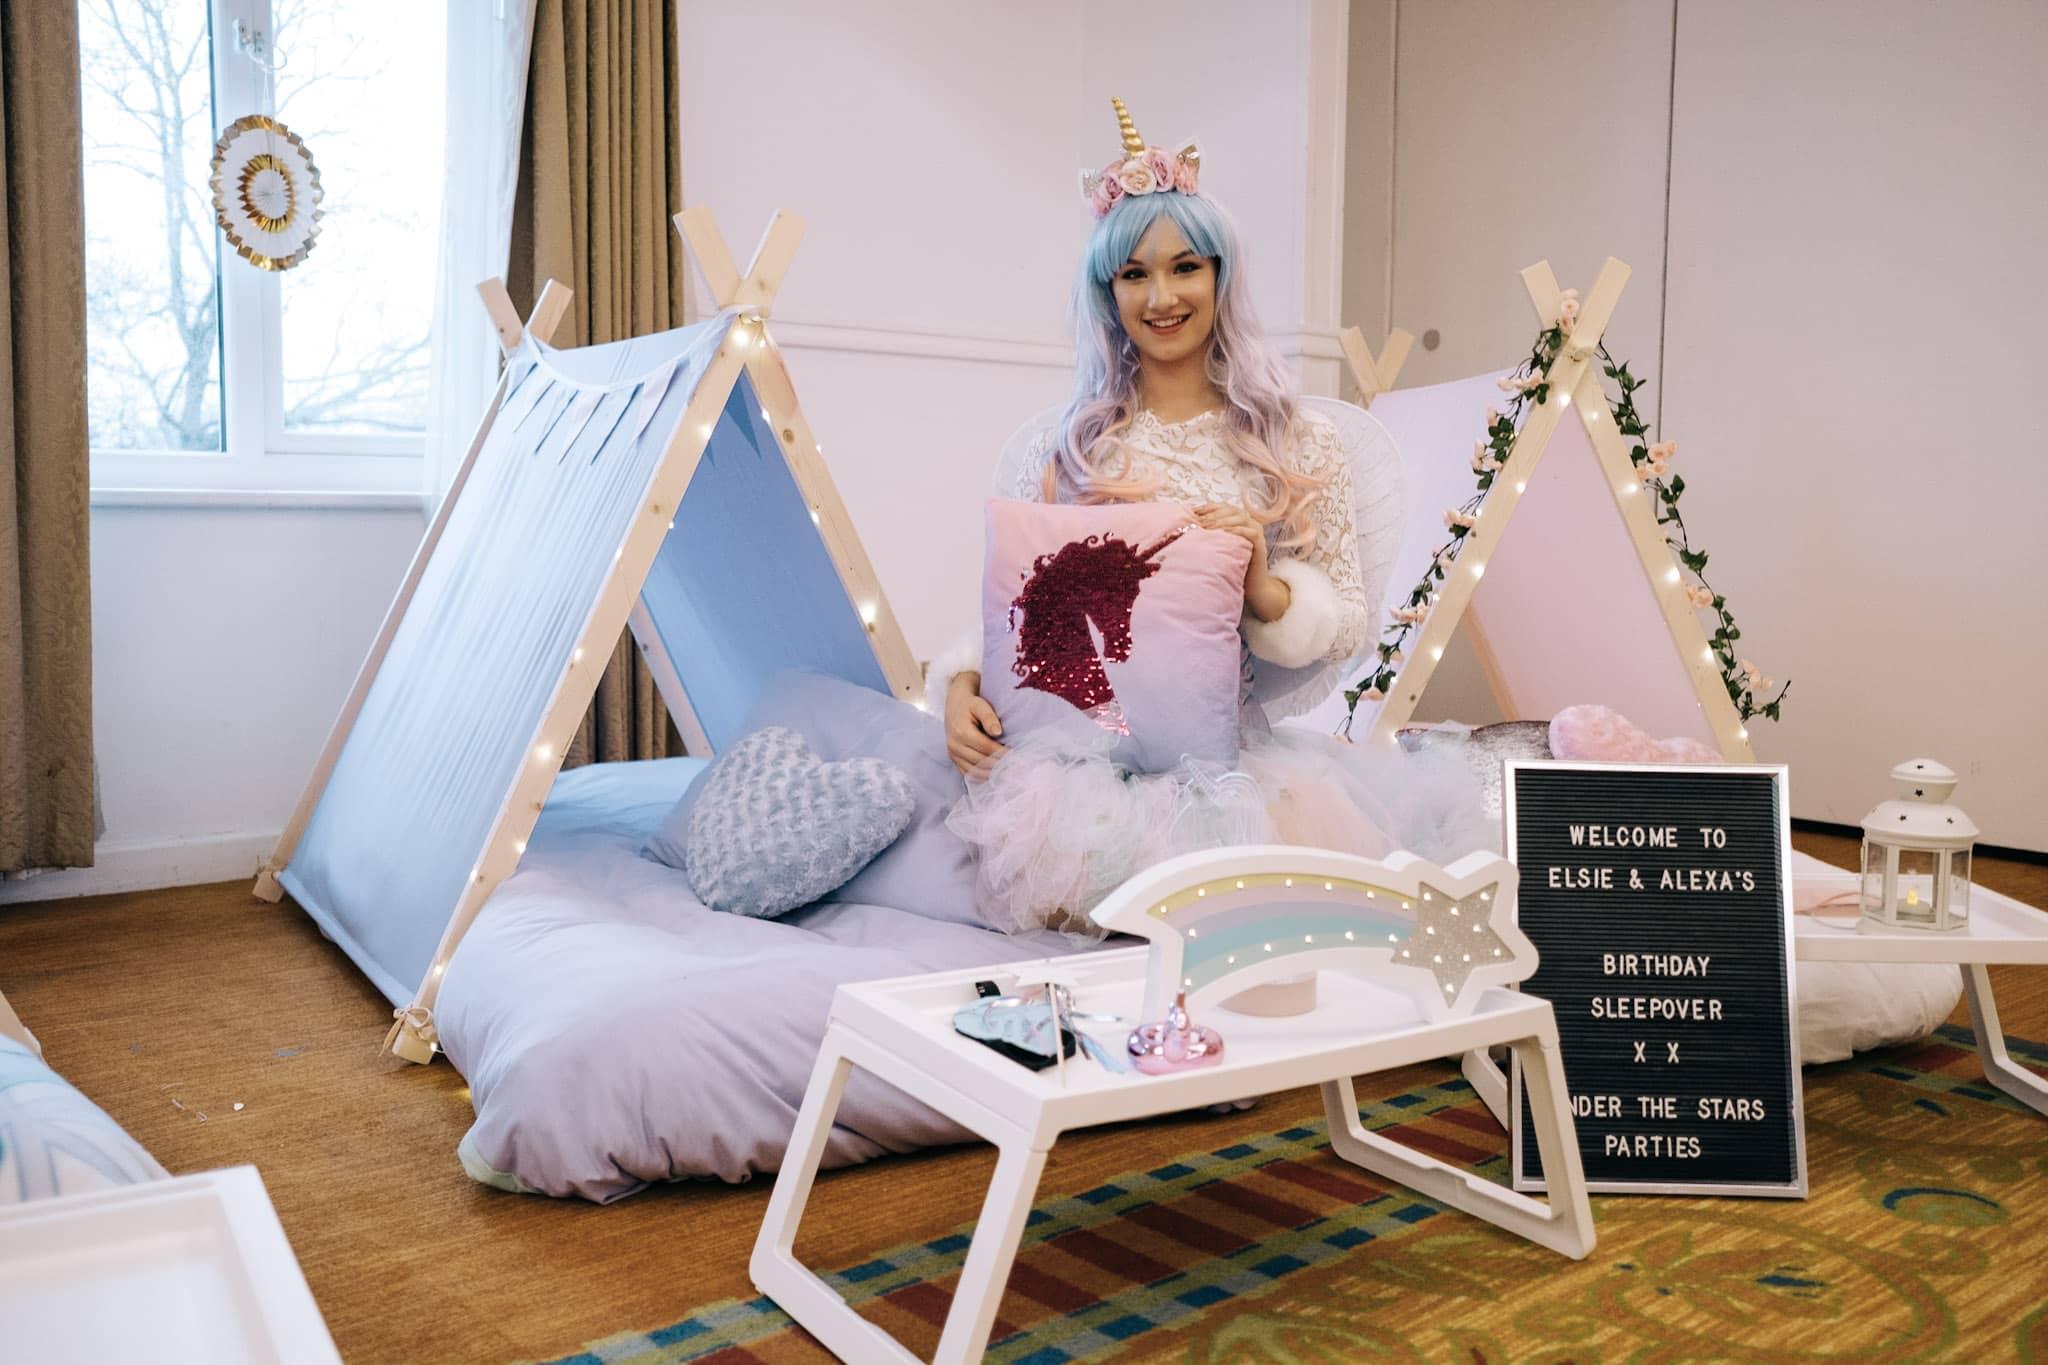 unicorn sleepover princess teepee party kent under the stars